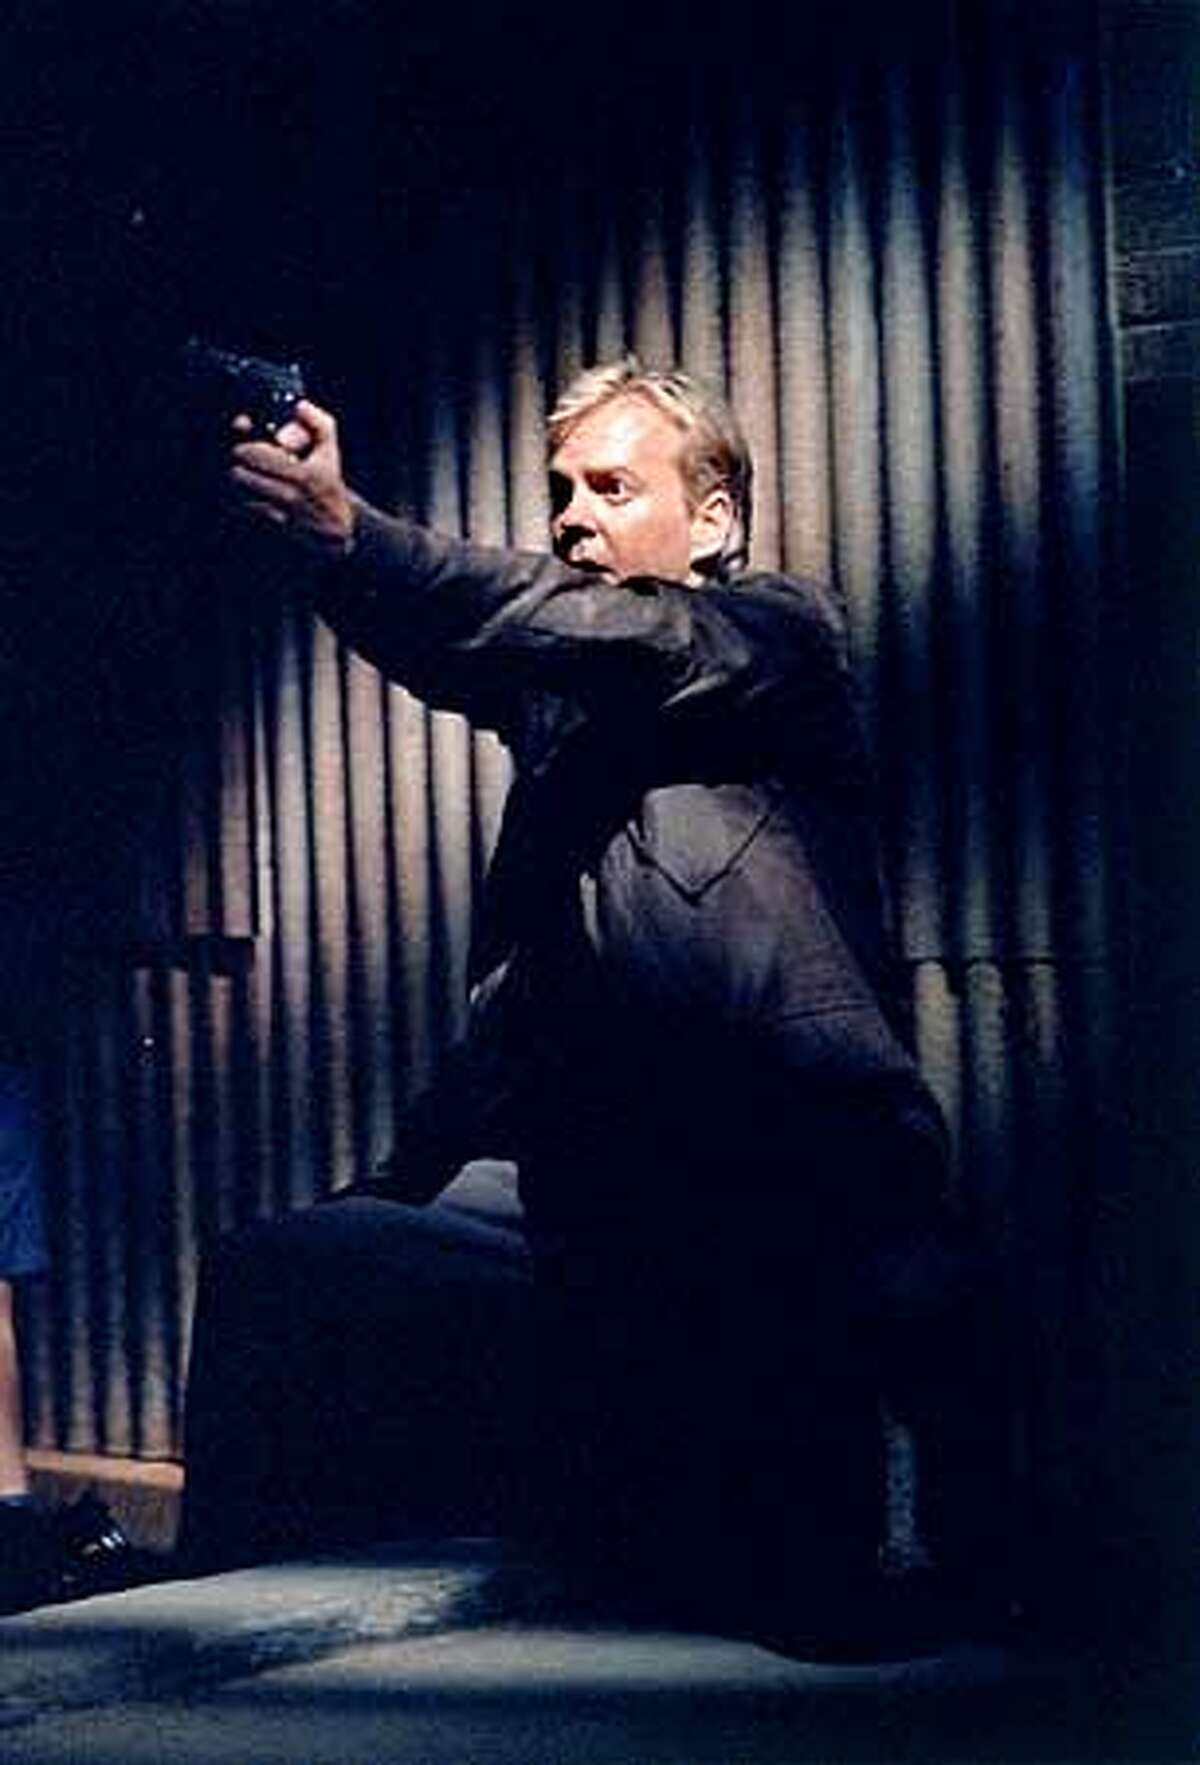 Keifer Sutherland as Jack Bauer on 24 on FOX. ��2001FOX BRODACASTING CR:Richard Foreman/FOX.